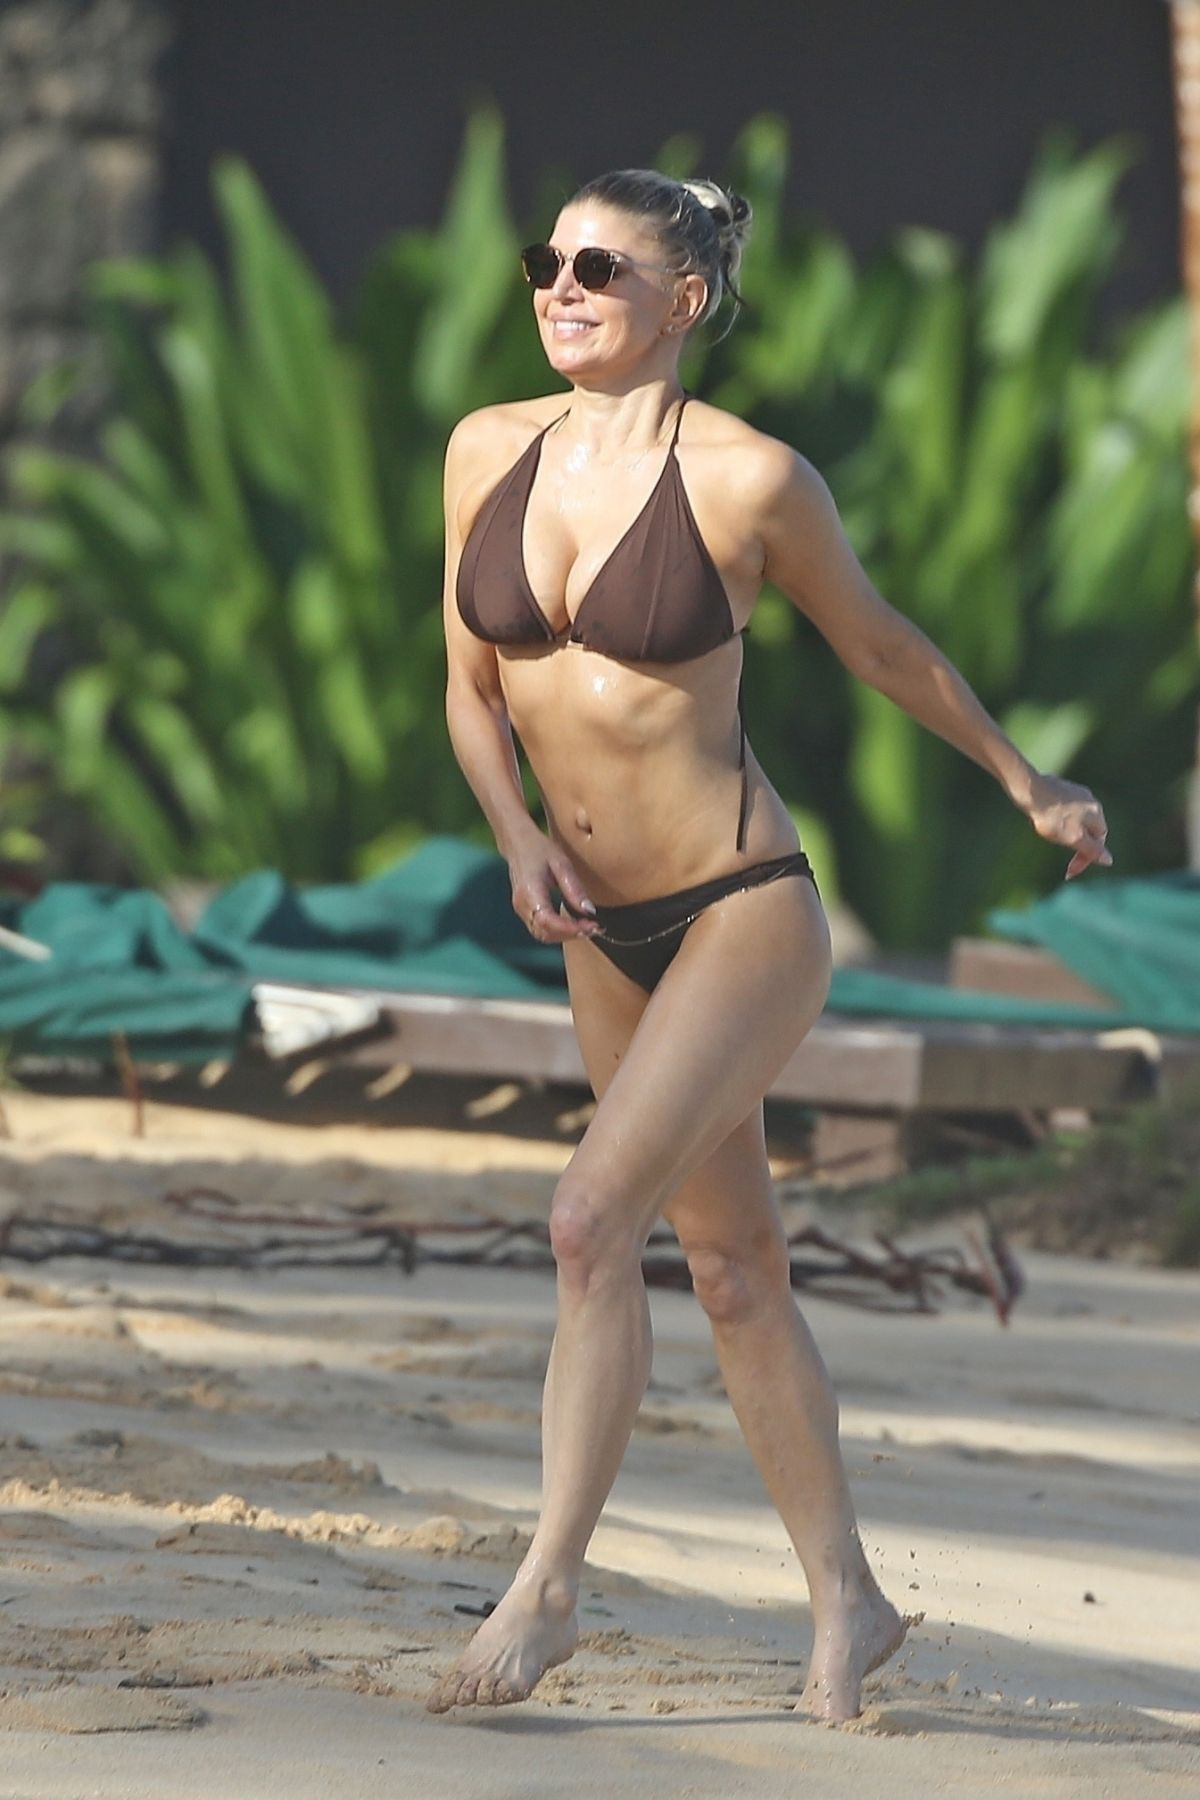 Stacey ferguson bikini